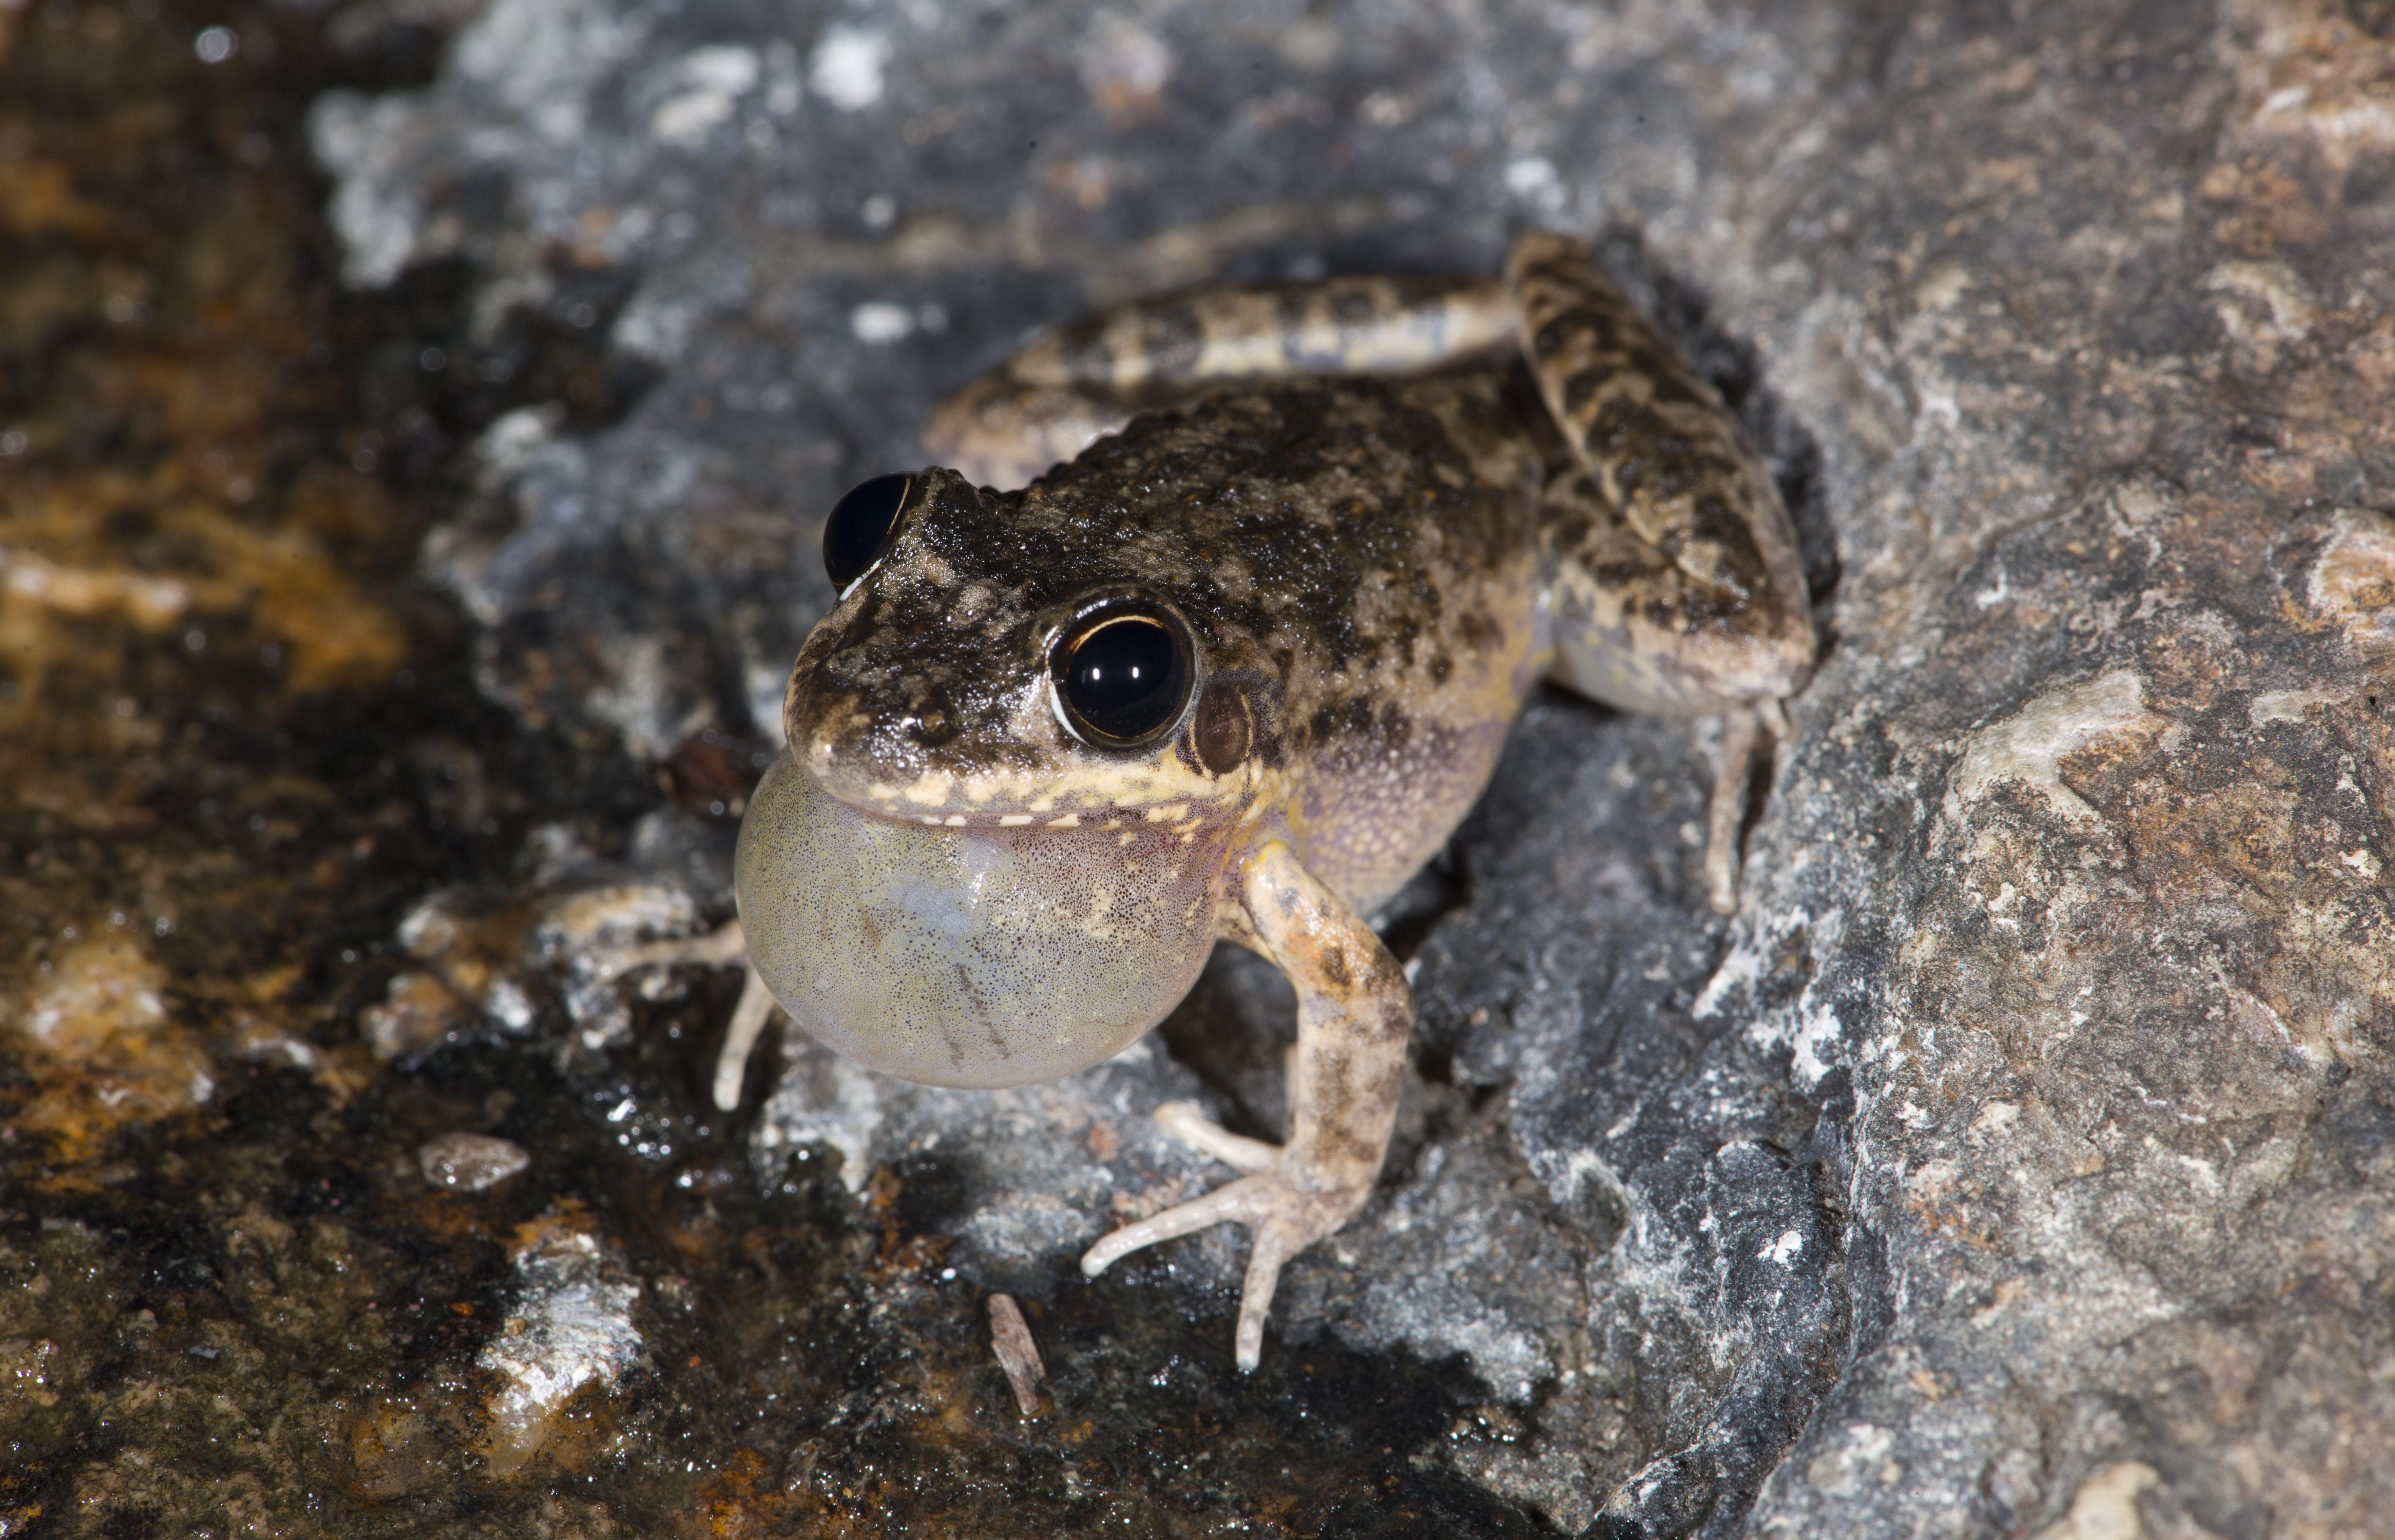 Bumpy Rocketfrog